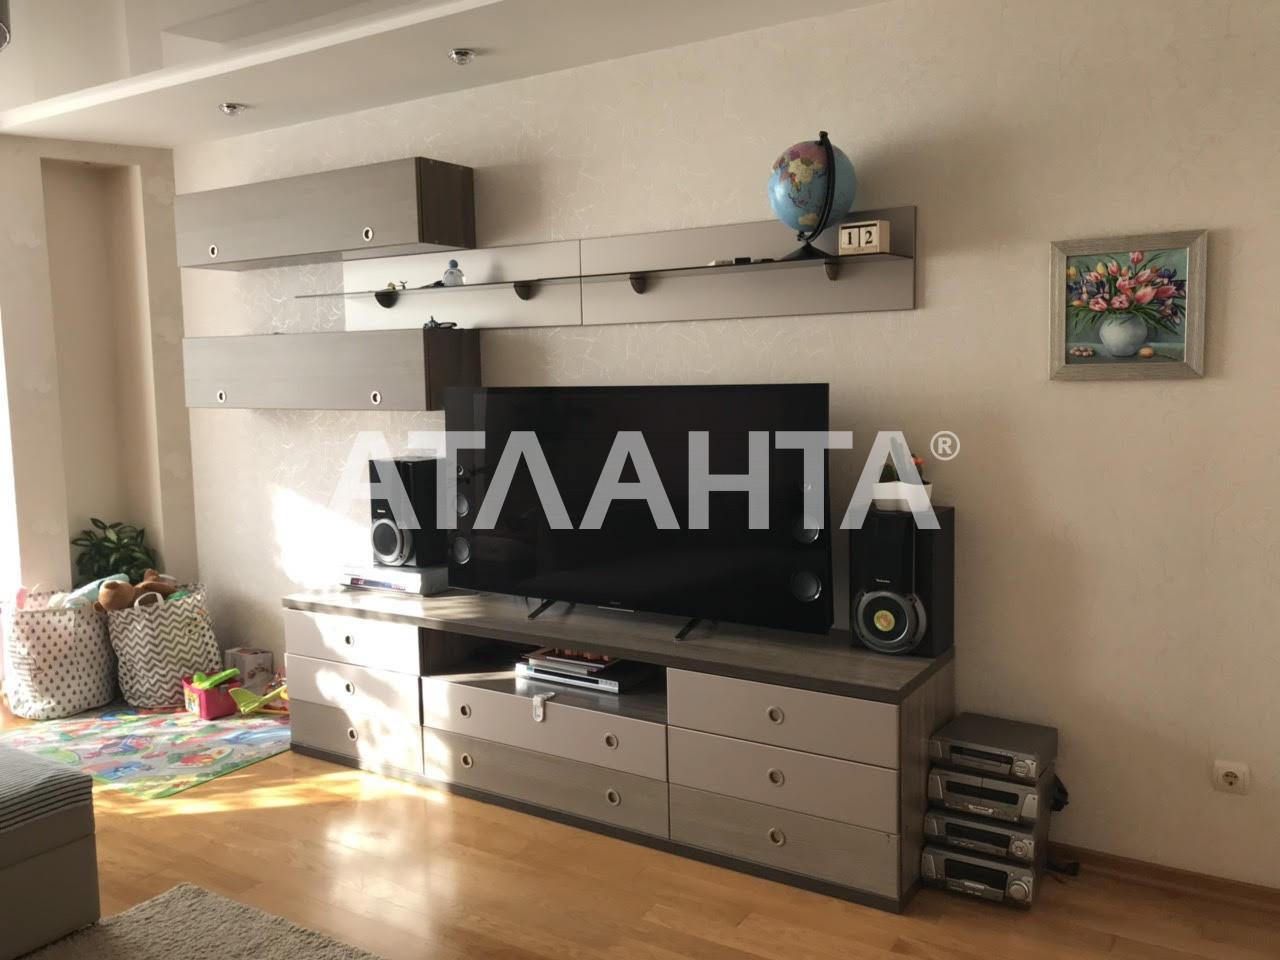 Продается 3-комнатная Квартира на ул. Ул. Ломоносова — 128 000 у.е. (фото №16)